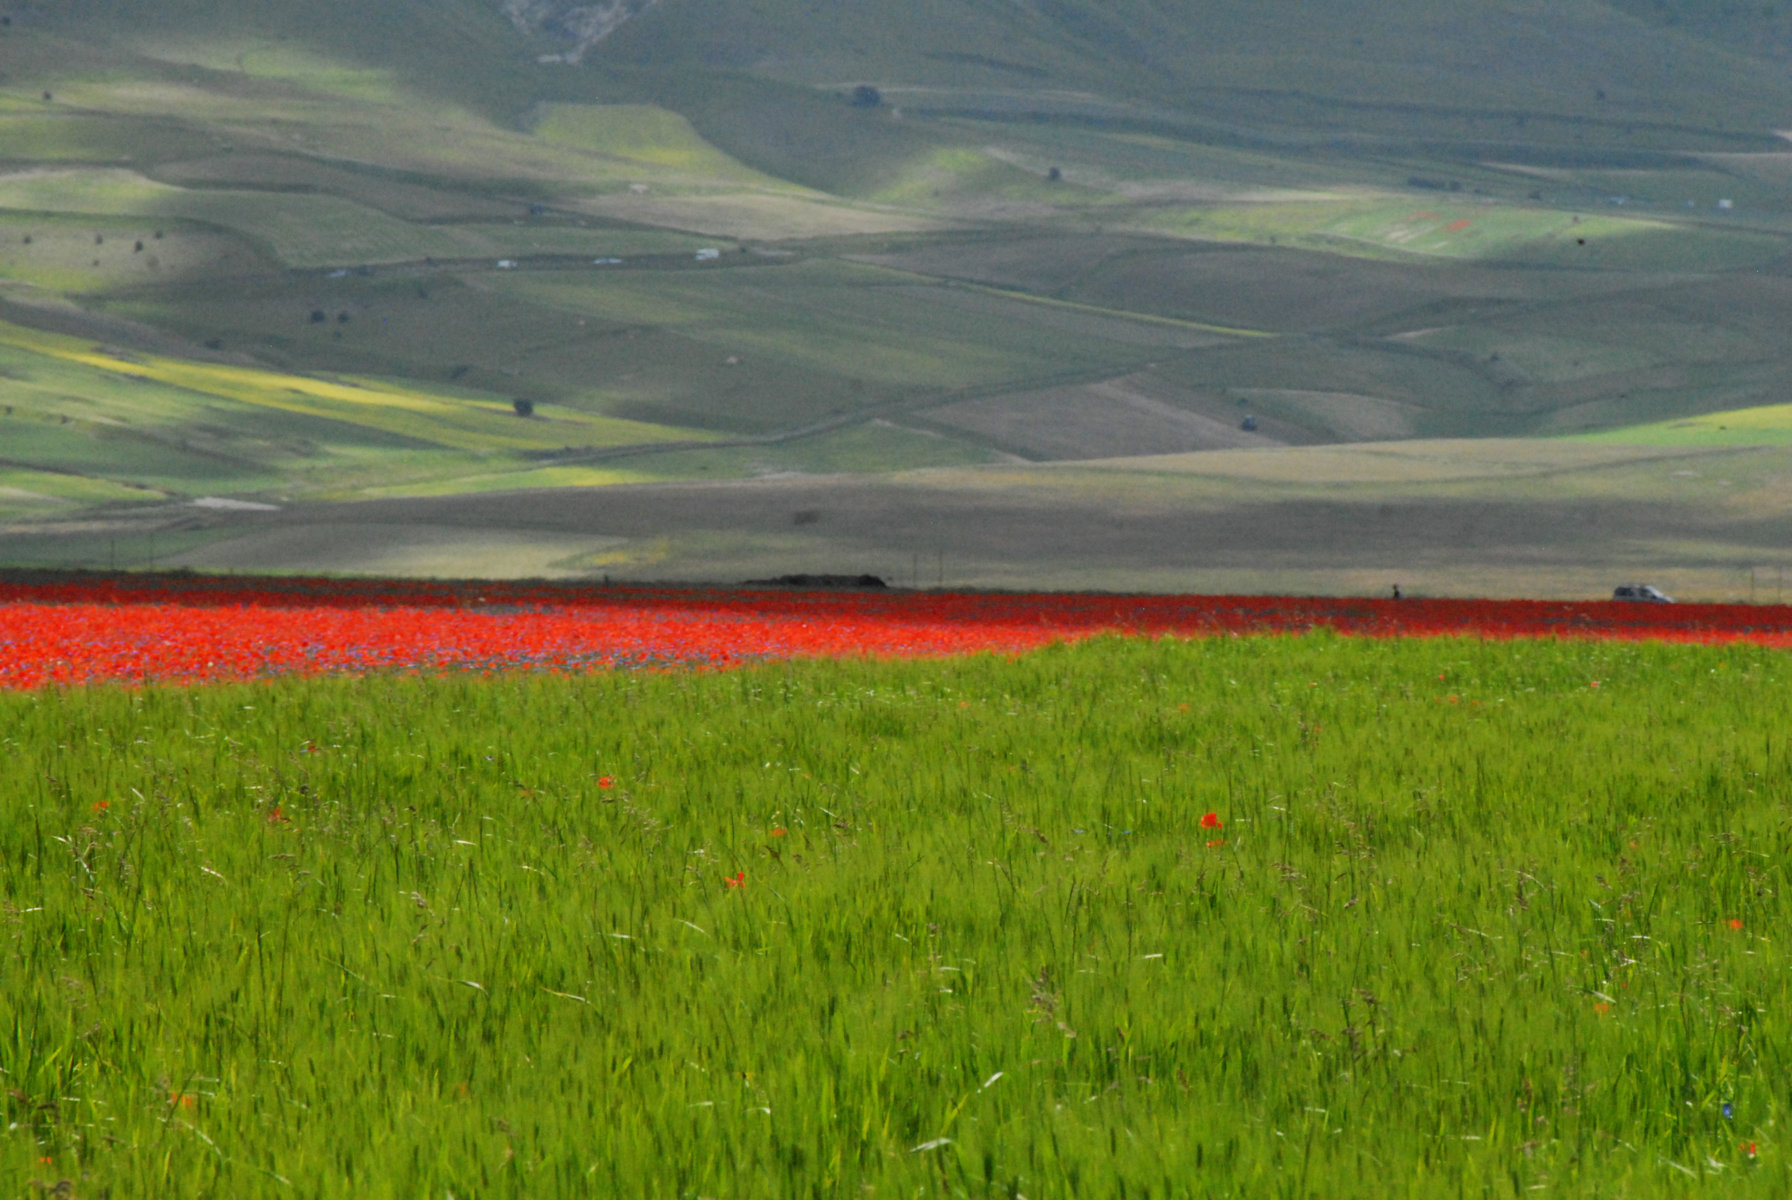 2014-la-fiorita-1a-609-fileminimizer